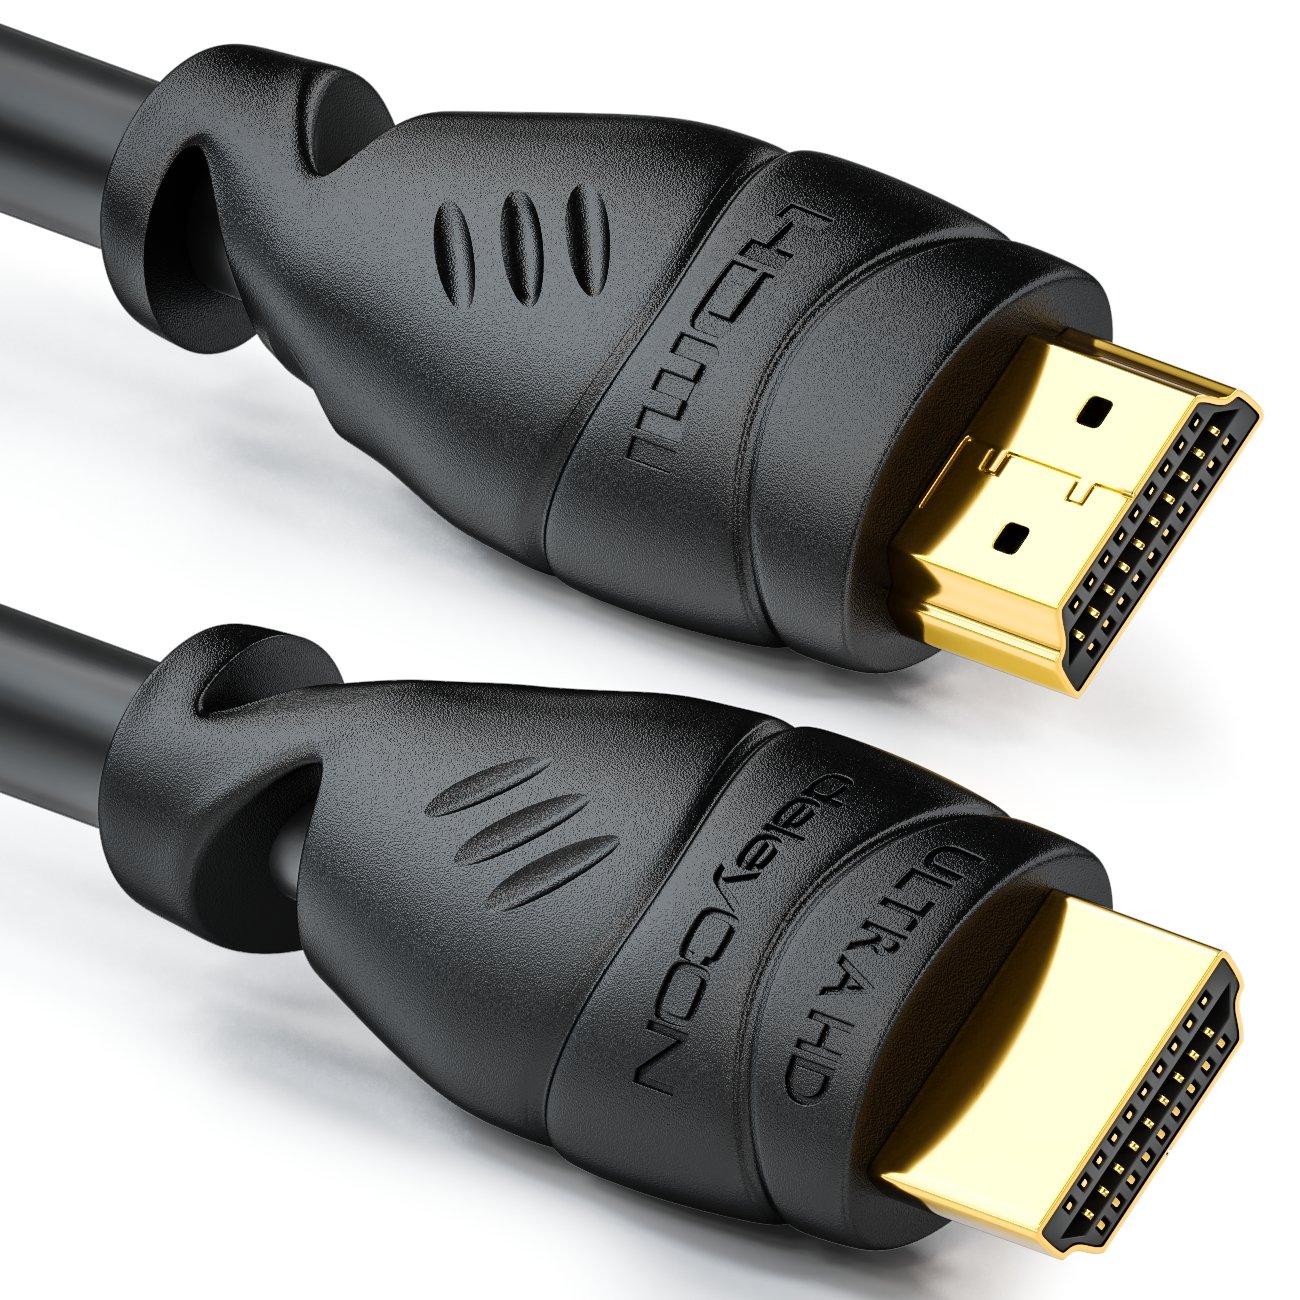 deleyCON 20m Cable HDMI - Compatible con HDMI 2.0a/b/1.4a UHD ...